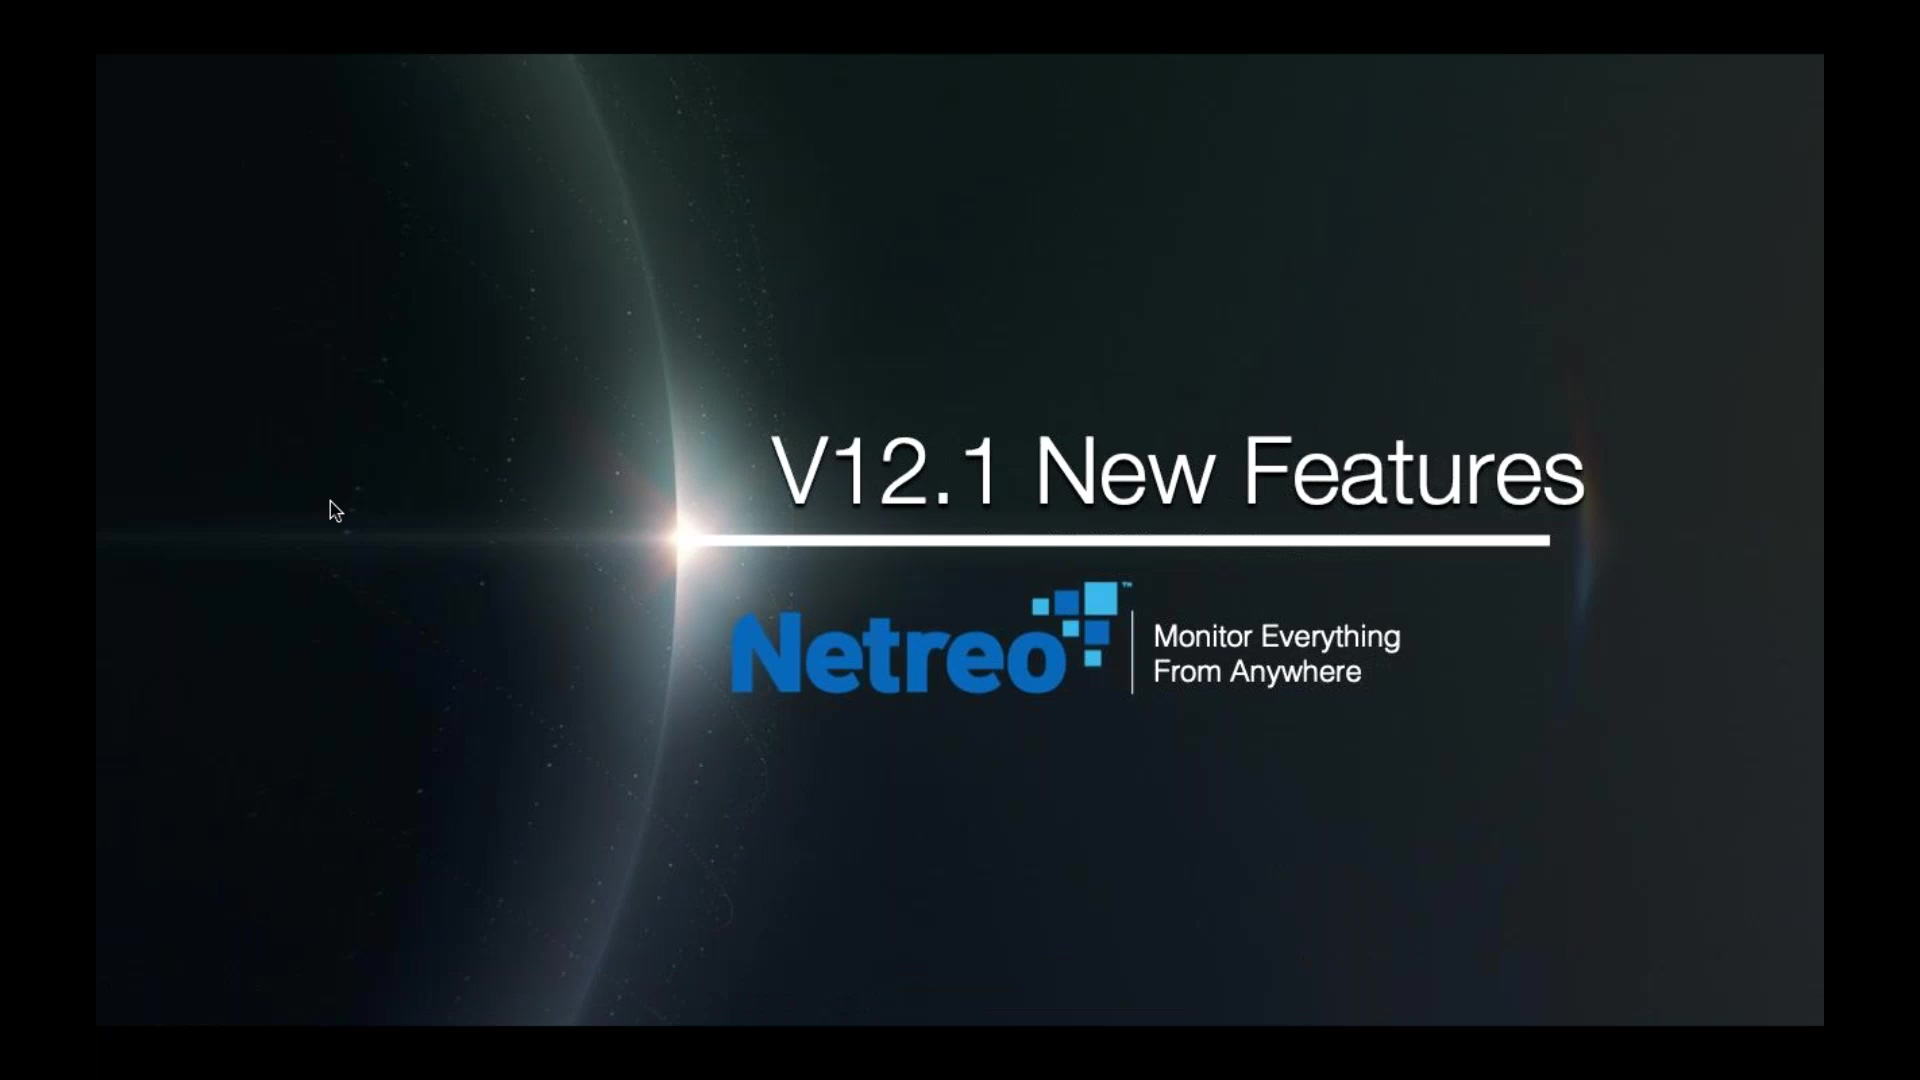 Introducing Netreo v12.1